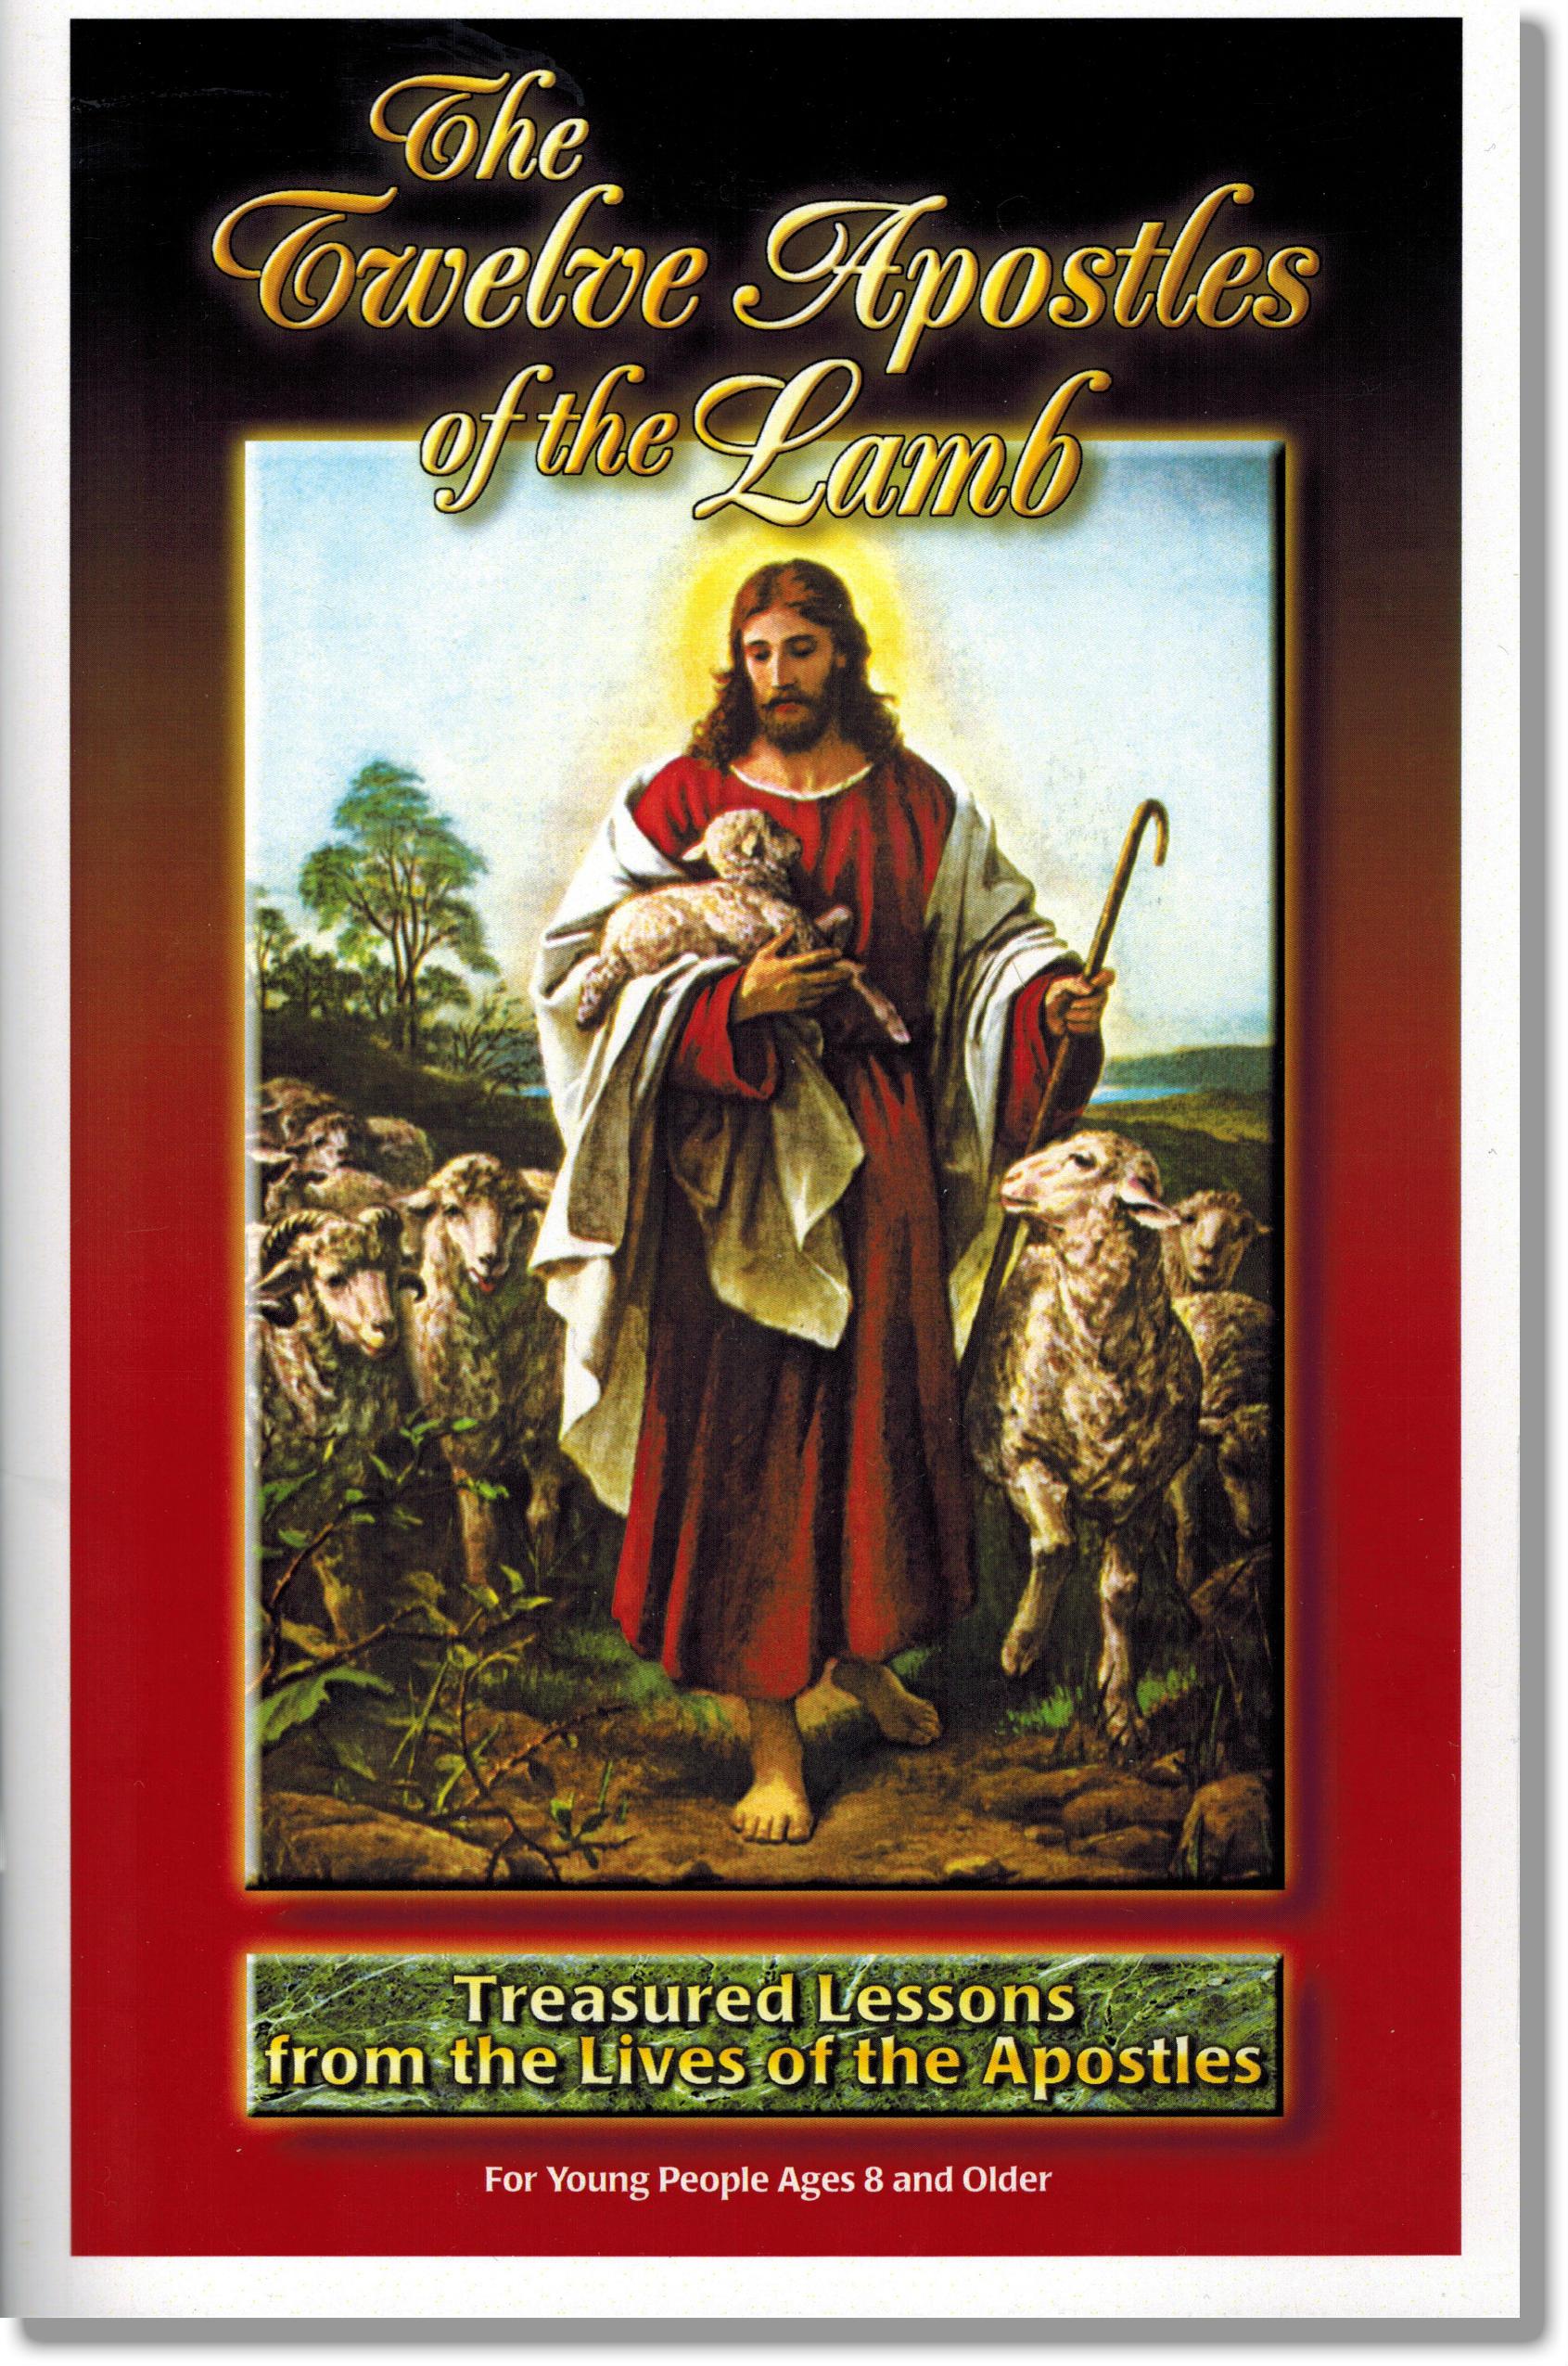 16e Twelve Apostles Of The Lamb